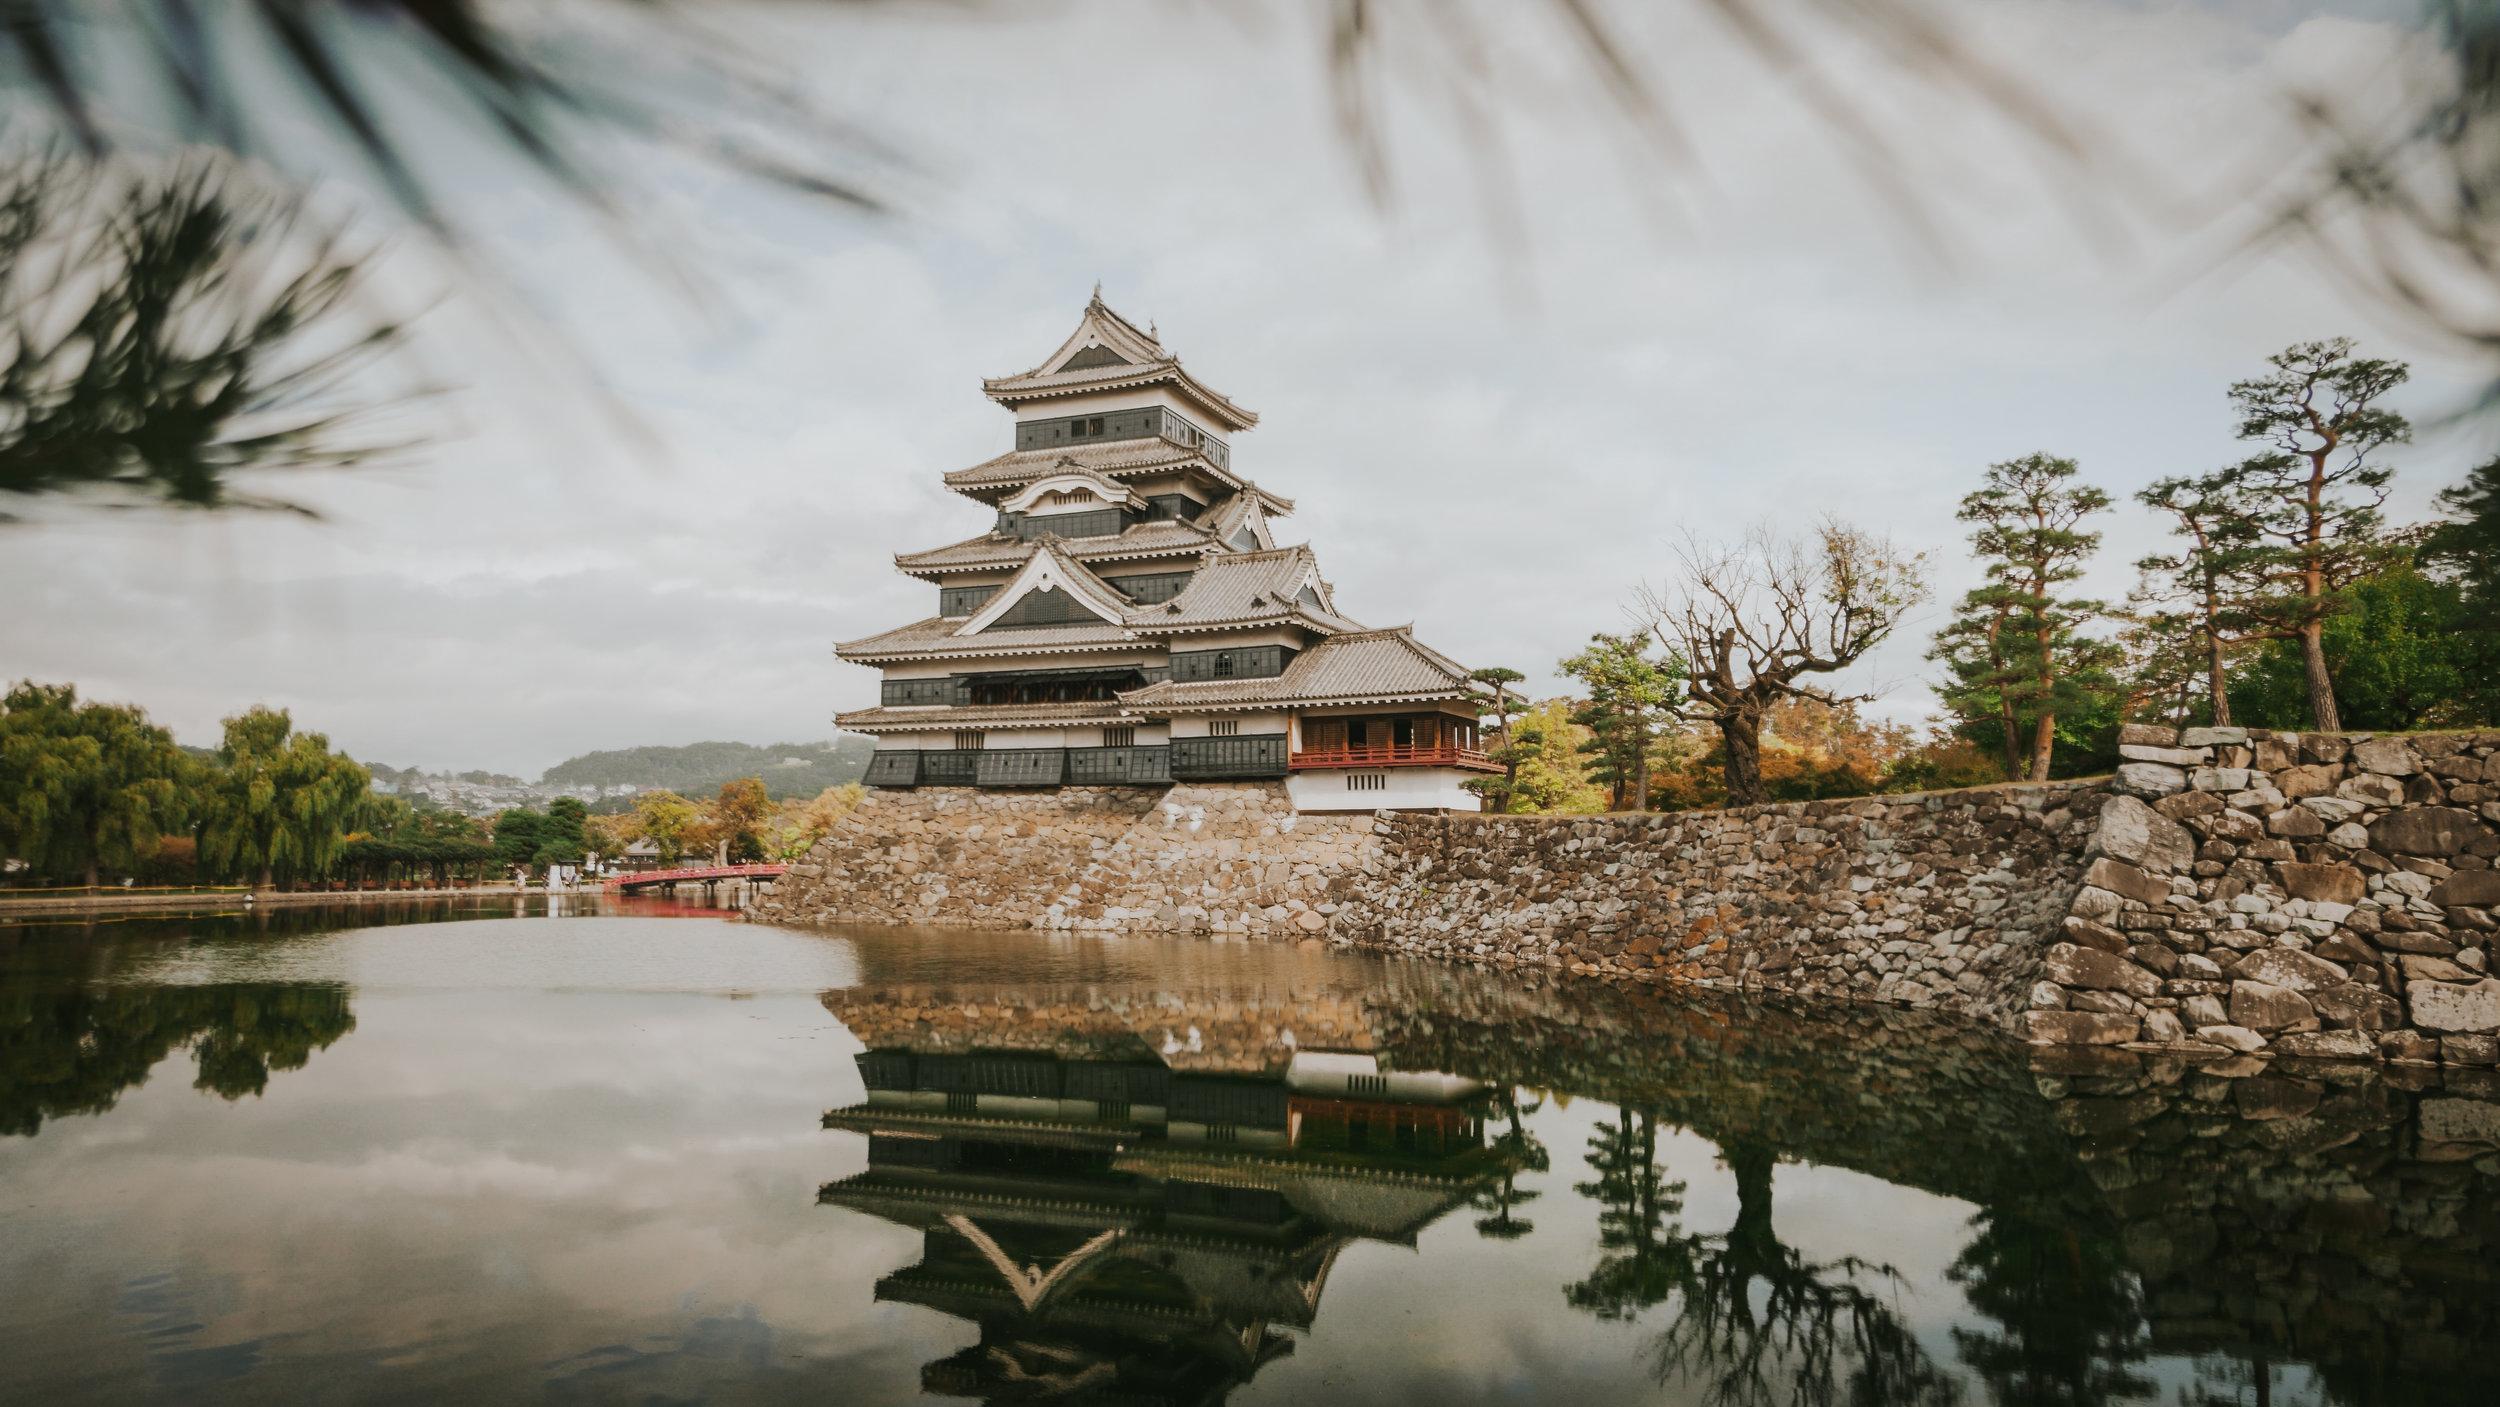 polywander-matsumoto-castle-what-to-see-in-matsumoto.jpeg